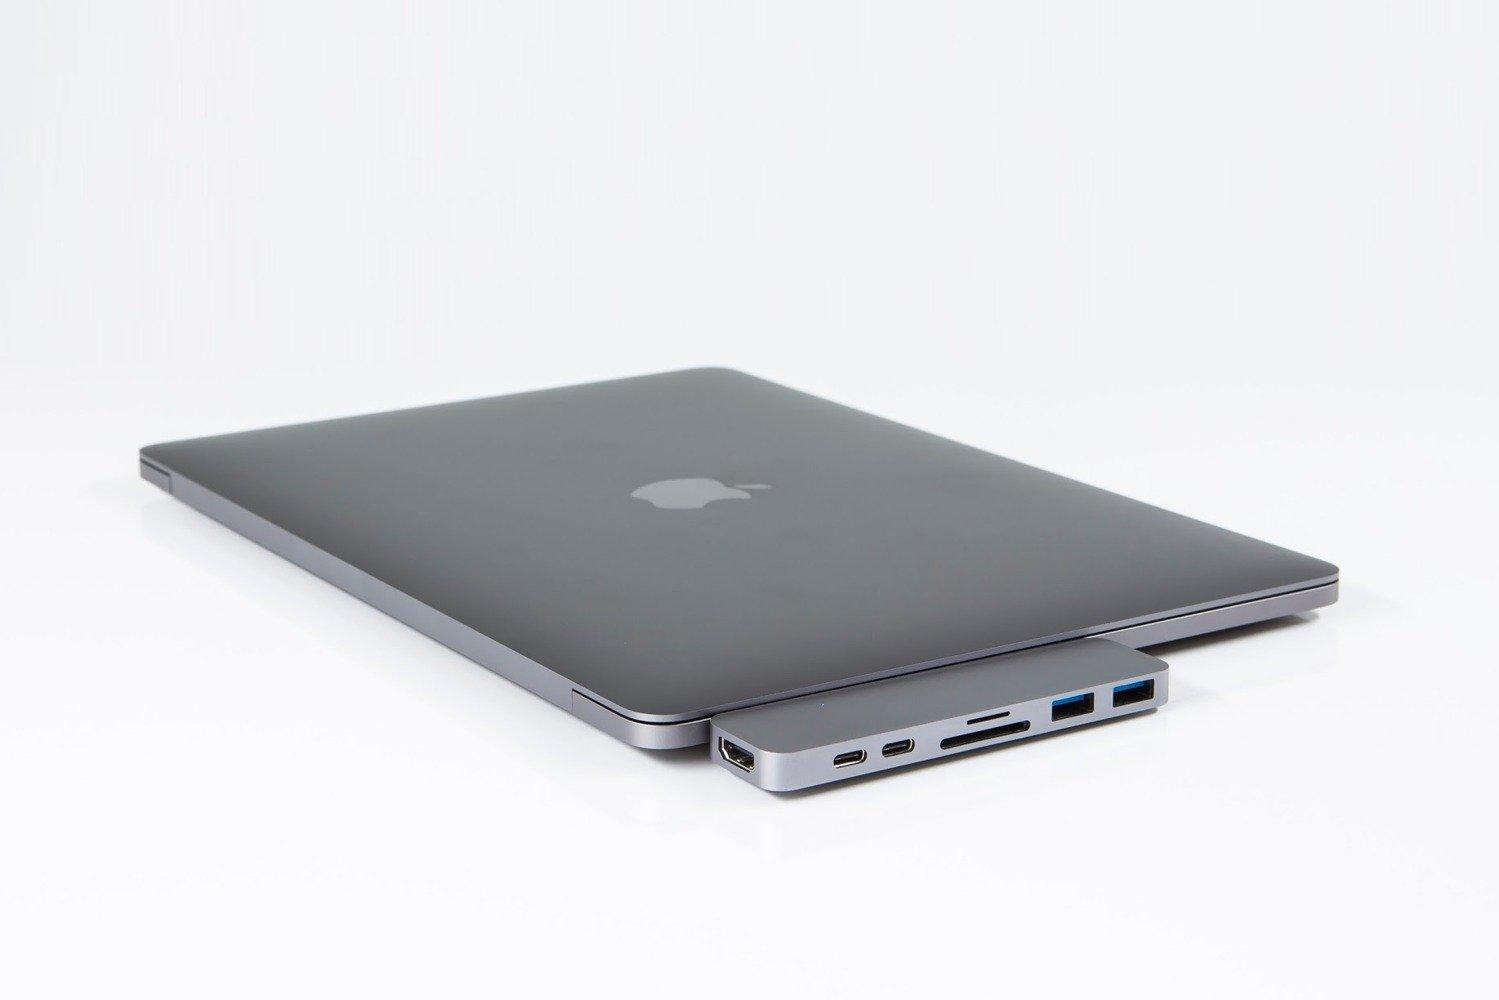 HyperDrive Thunderbolt 3 USB-C Hub for MacBook Pro Space ...